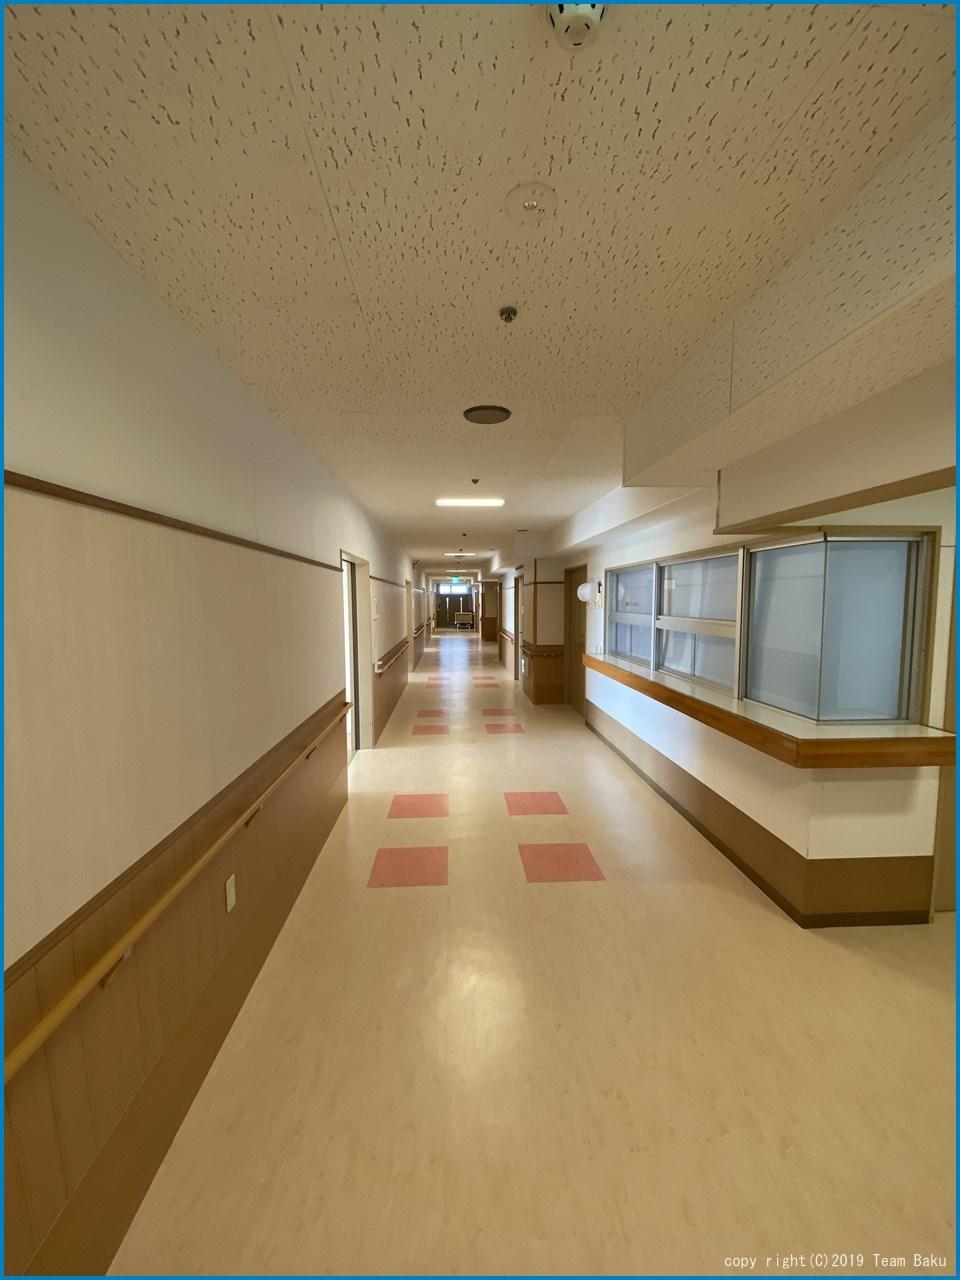 N病院グループ Nナーシング南館 改修・増築工事 4_c0376508_18053460.jpg